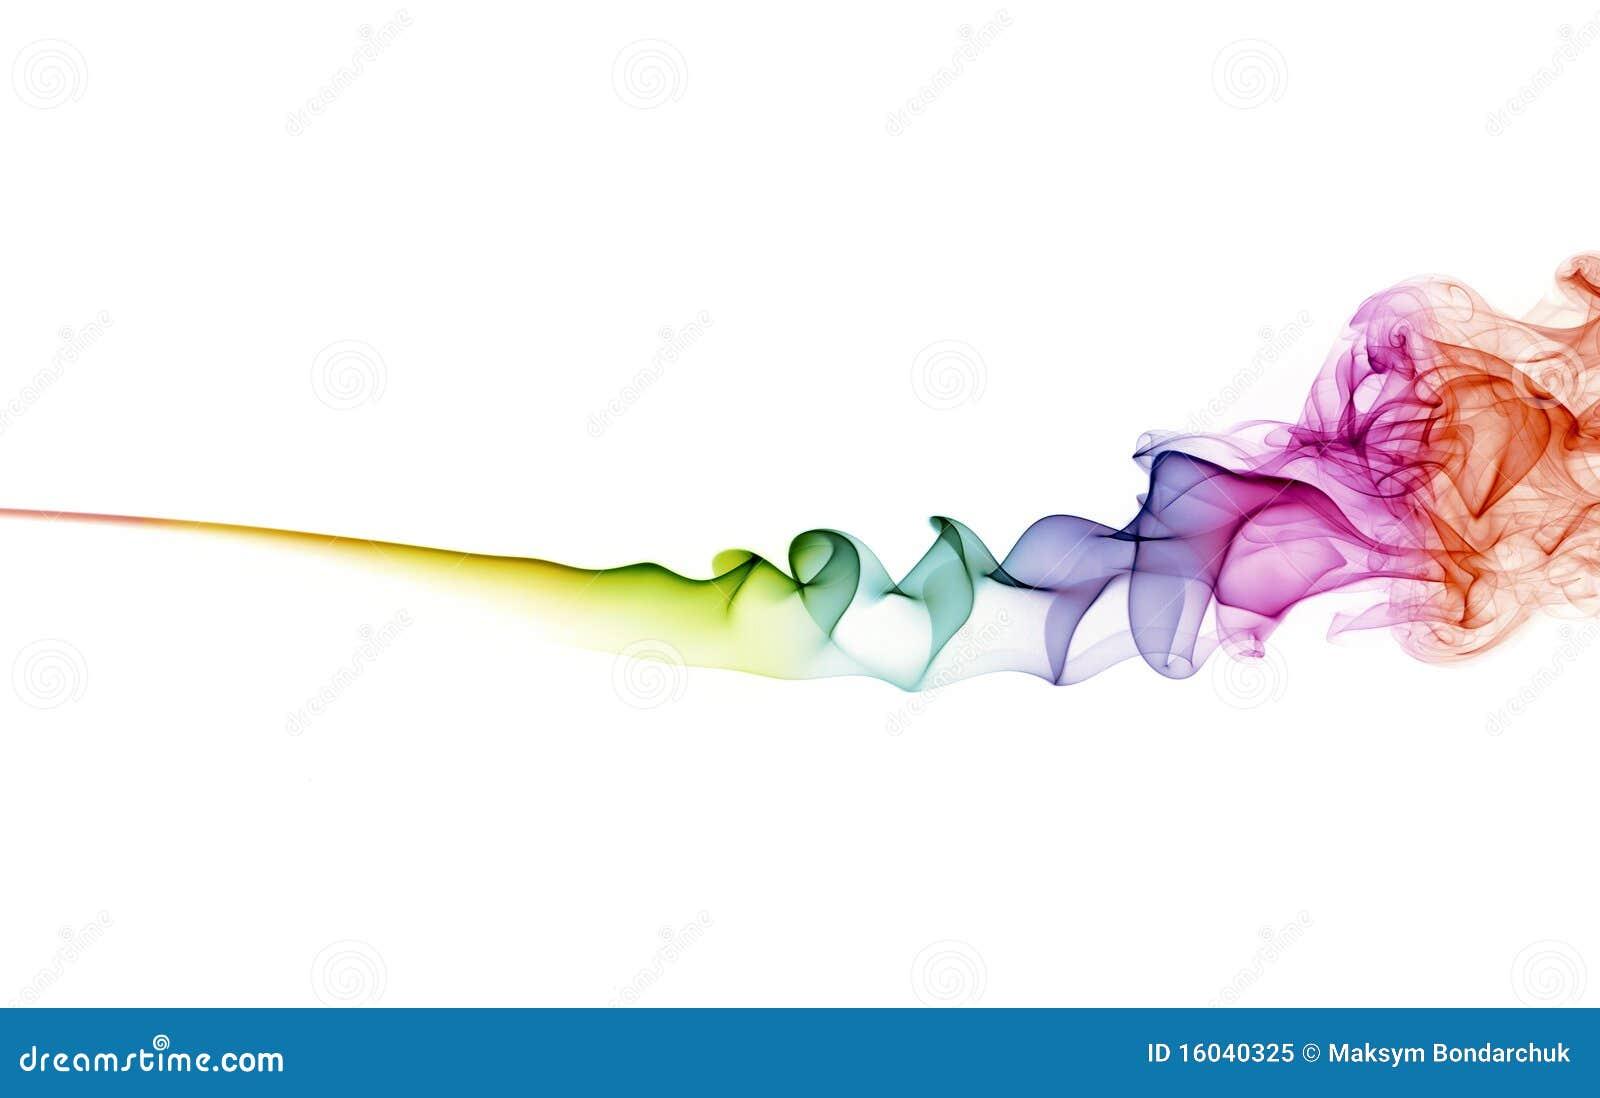 Abstracte kleurenrook op witte achtergrond